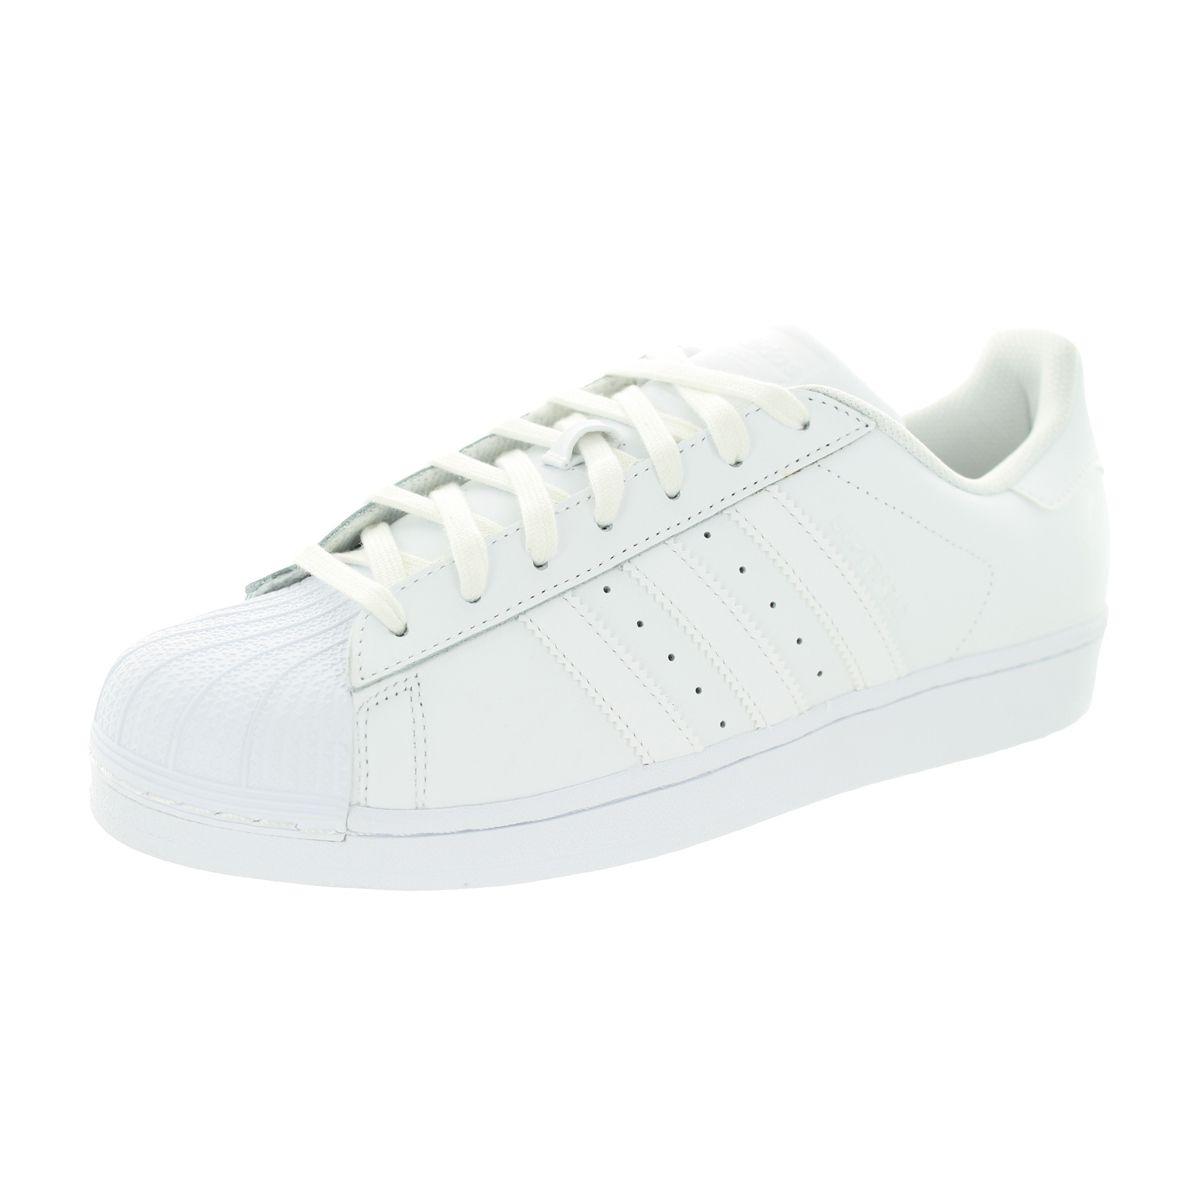 Adidas Men's Superstar Foundation Originals // Basketball Shoe